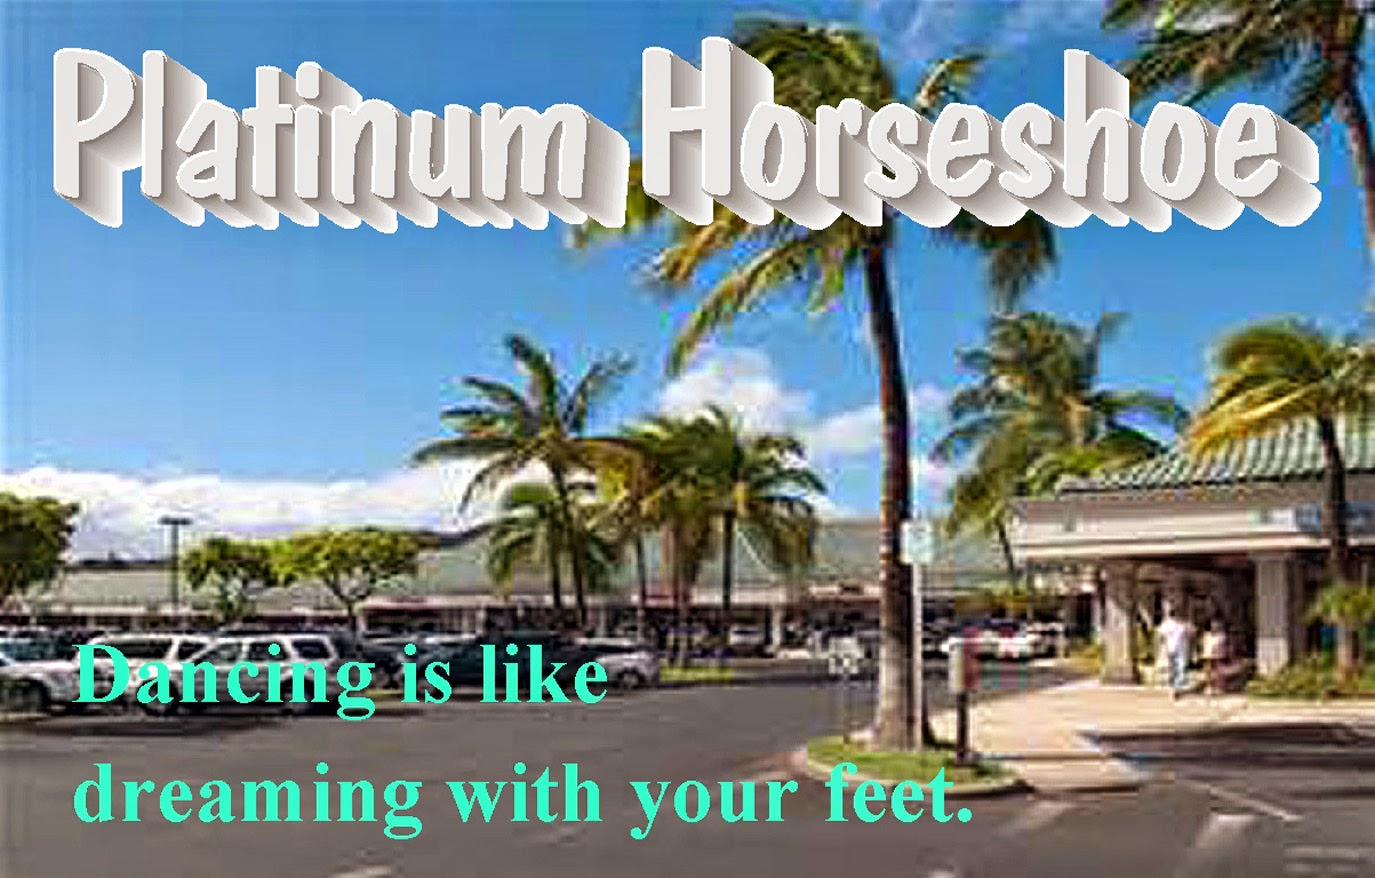 The Platinum Horseshoe